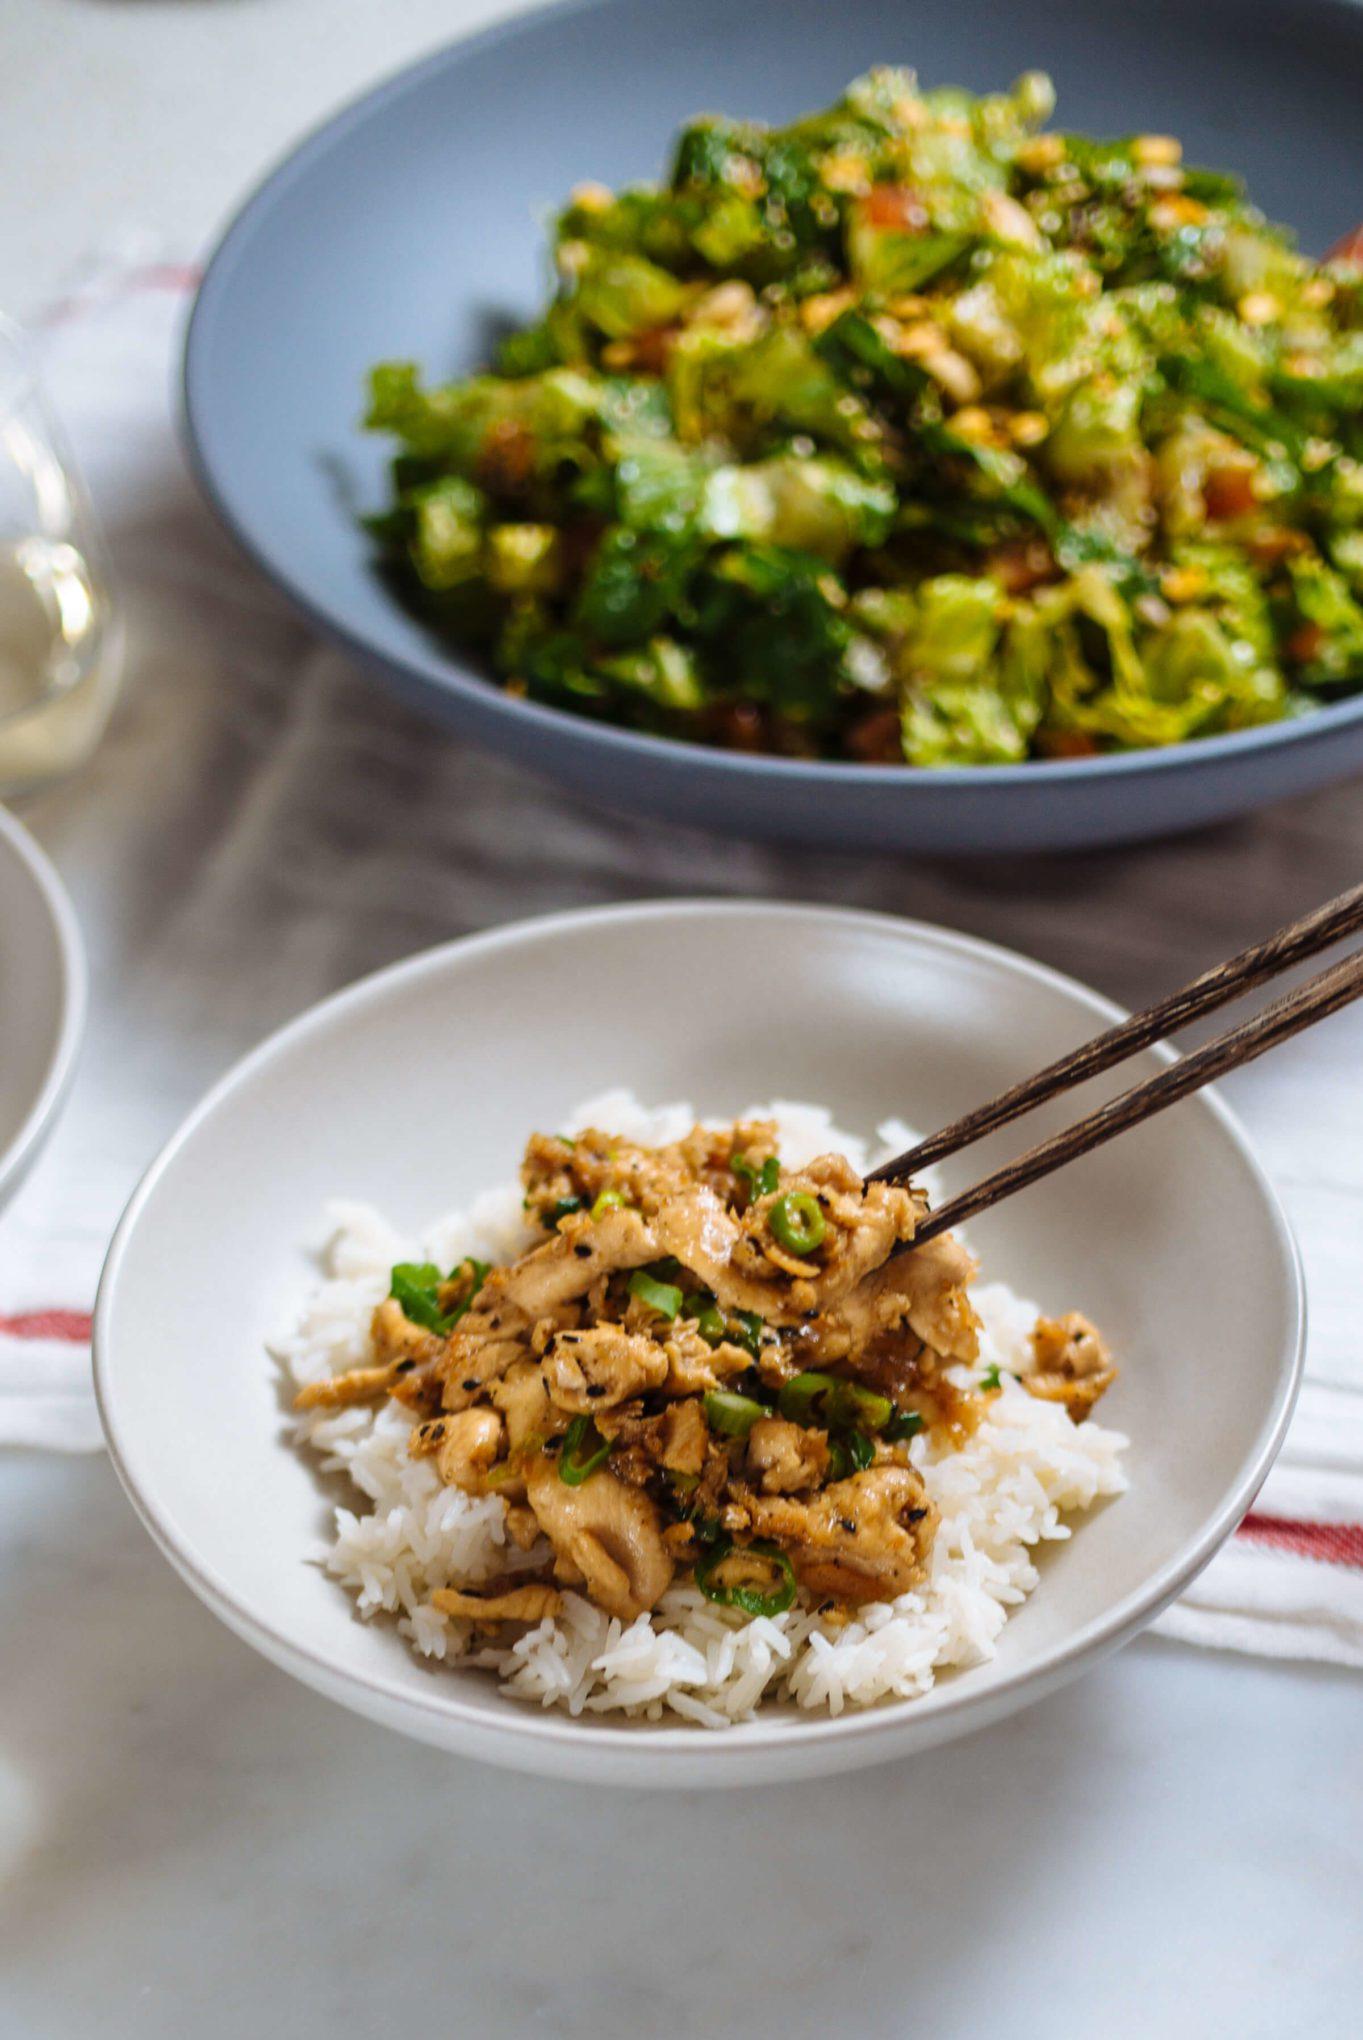 Burma Superstar cookbook Sesame Chicken made by The Taste SF